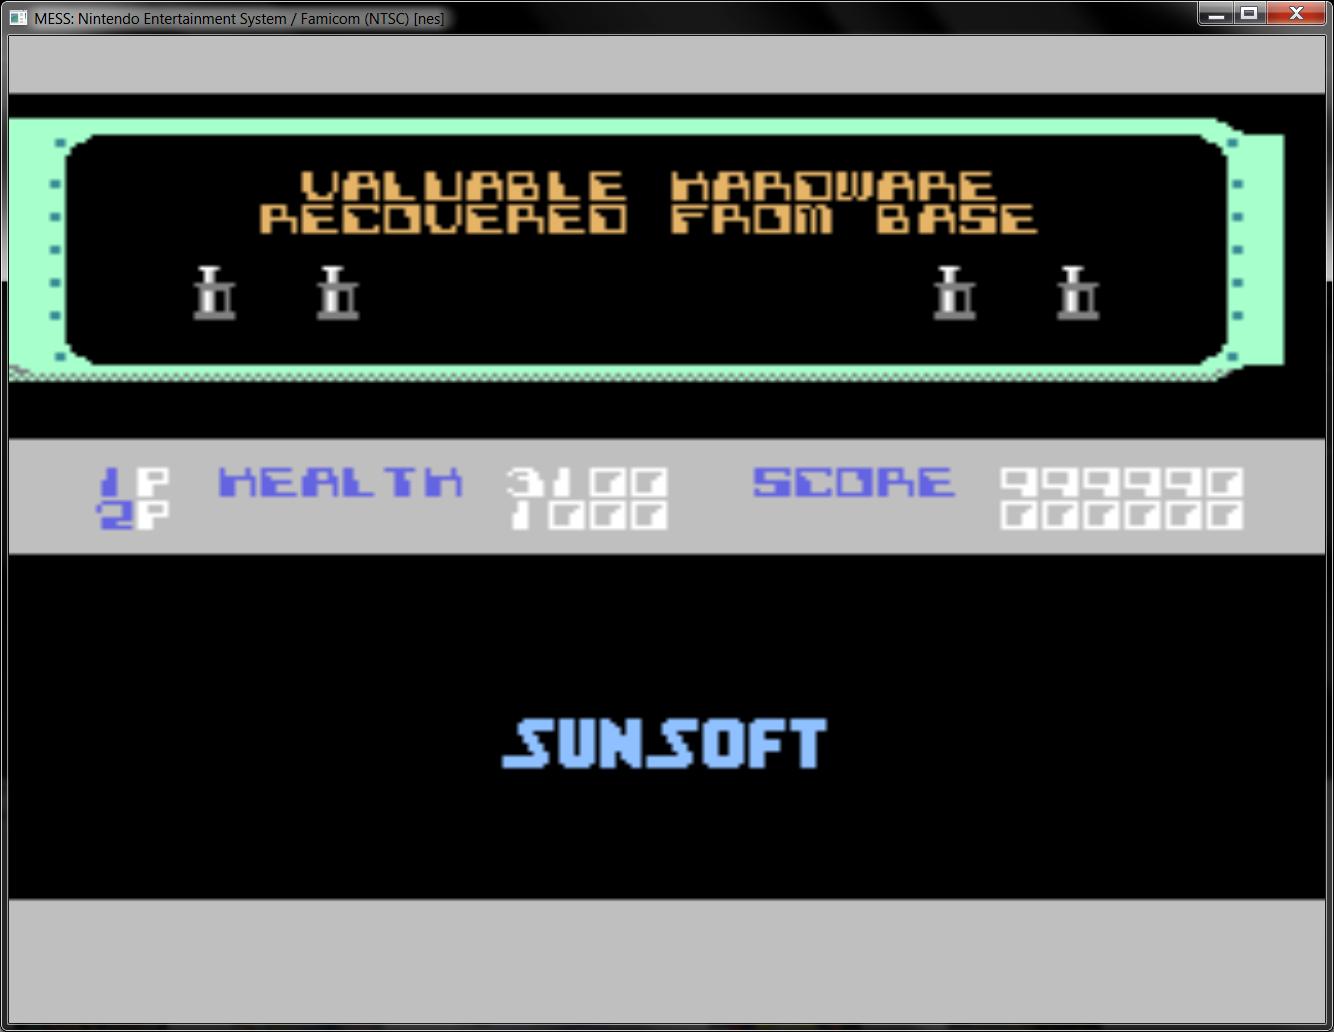 DonAtreides: Xenophobe (NES/Famicom Emulated) 999,990 points on 2014-07-03 18:11:22